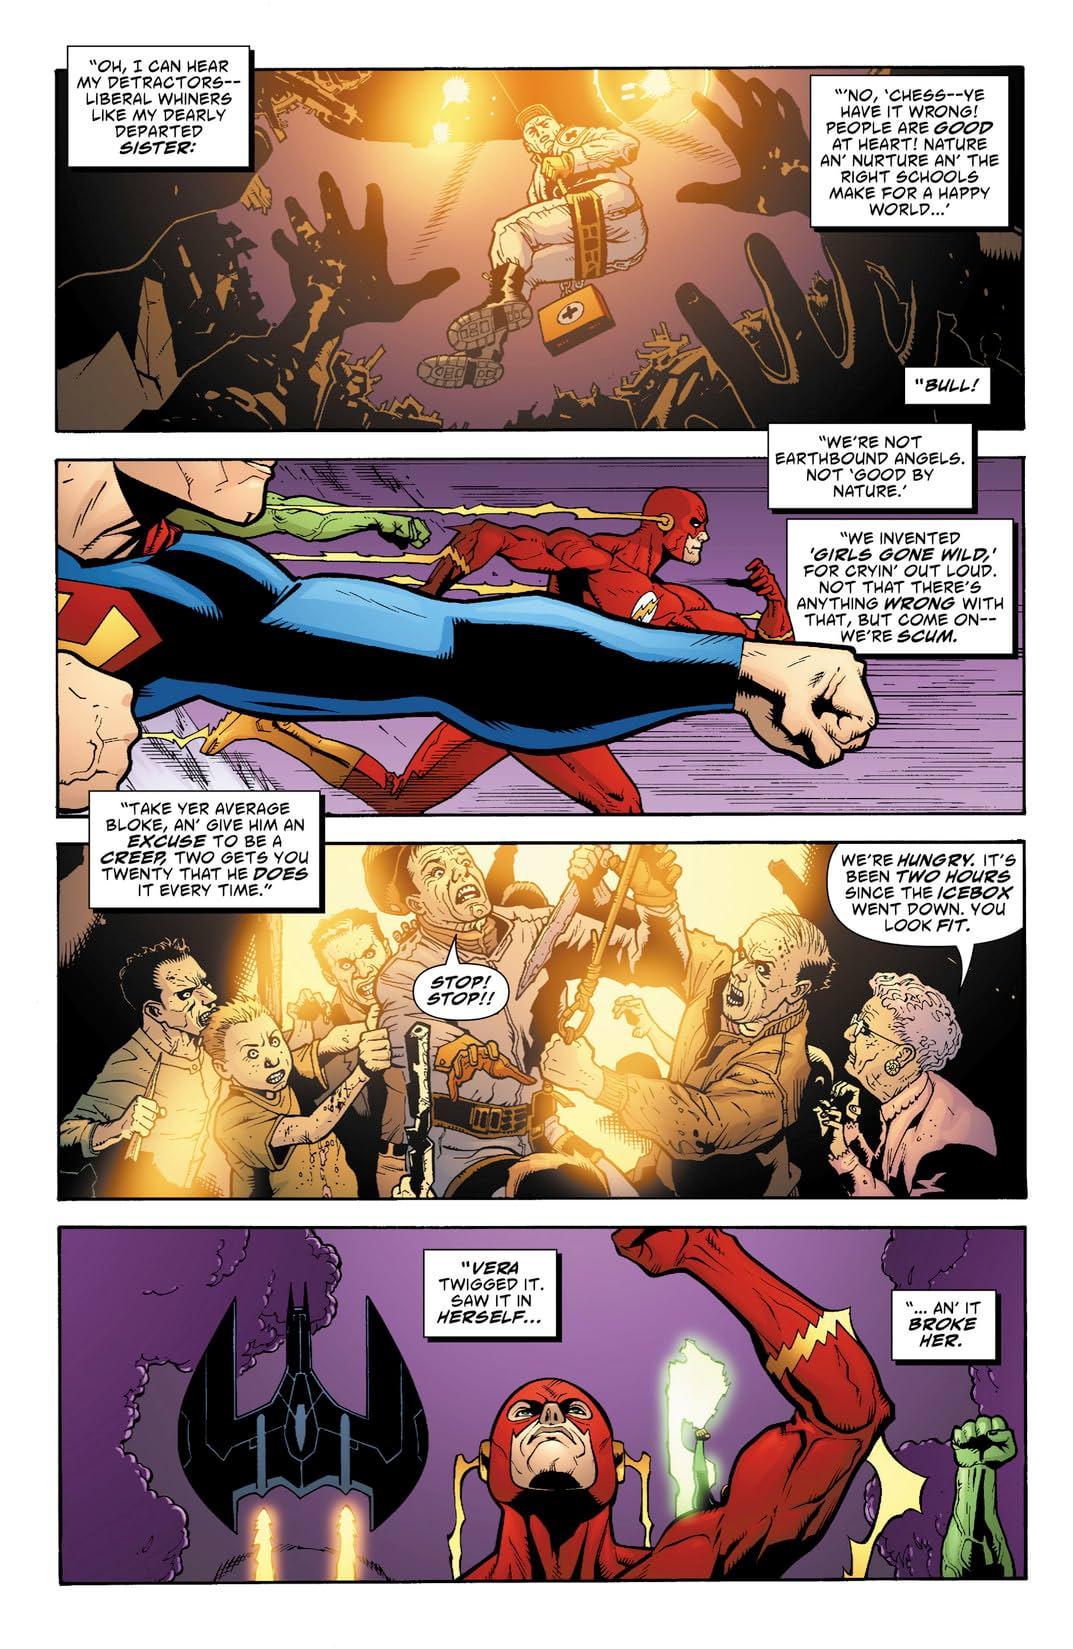 Justice League Elite #11 (of 12)